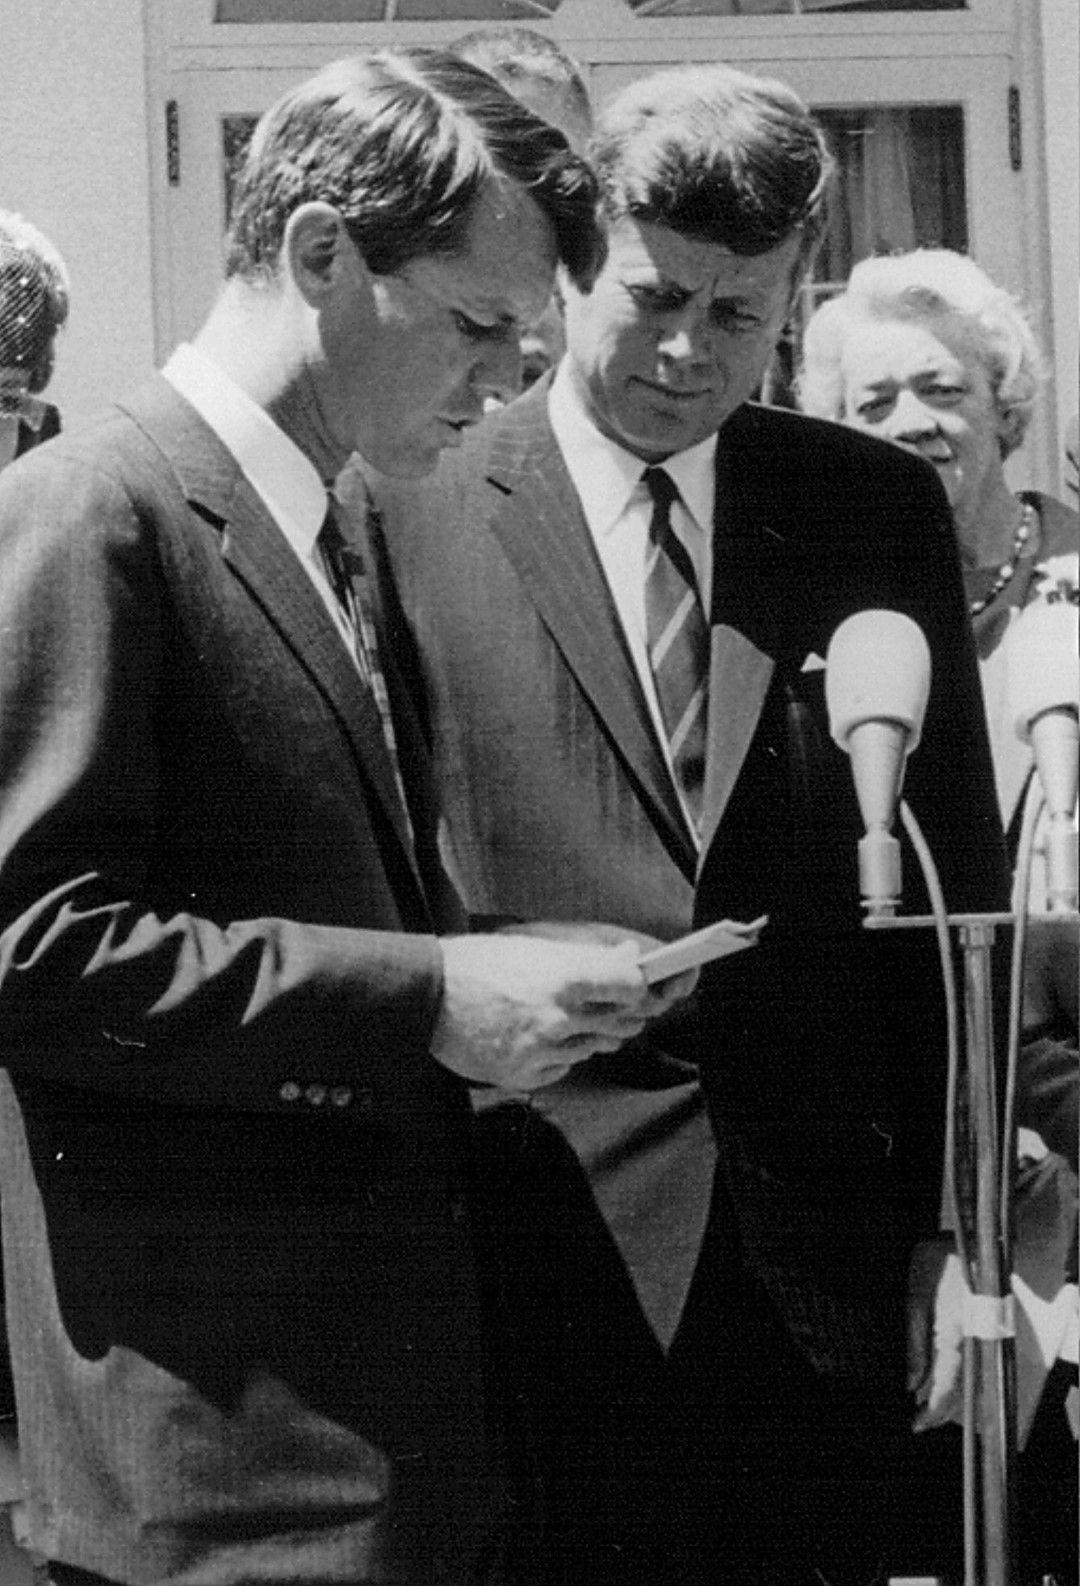 Робърт и Джон Кенеди